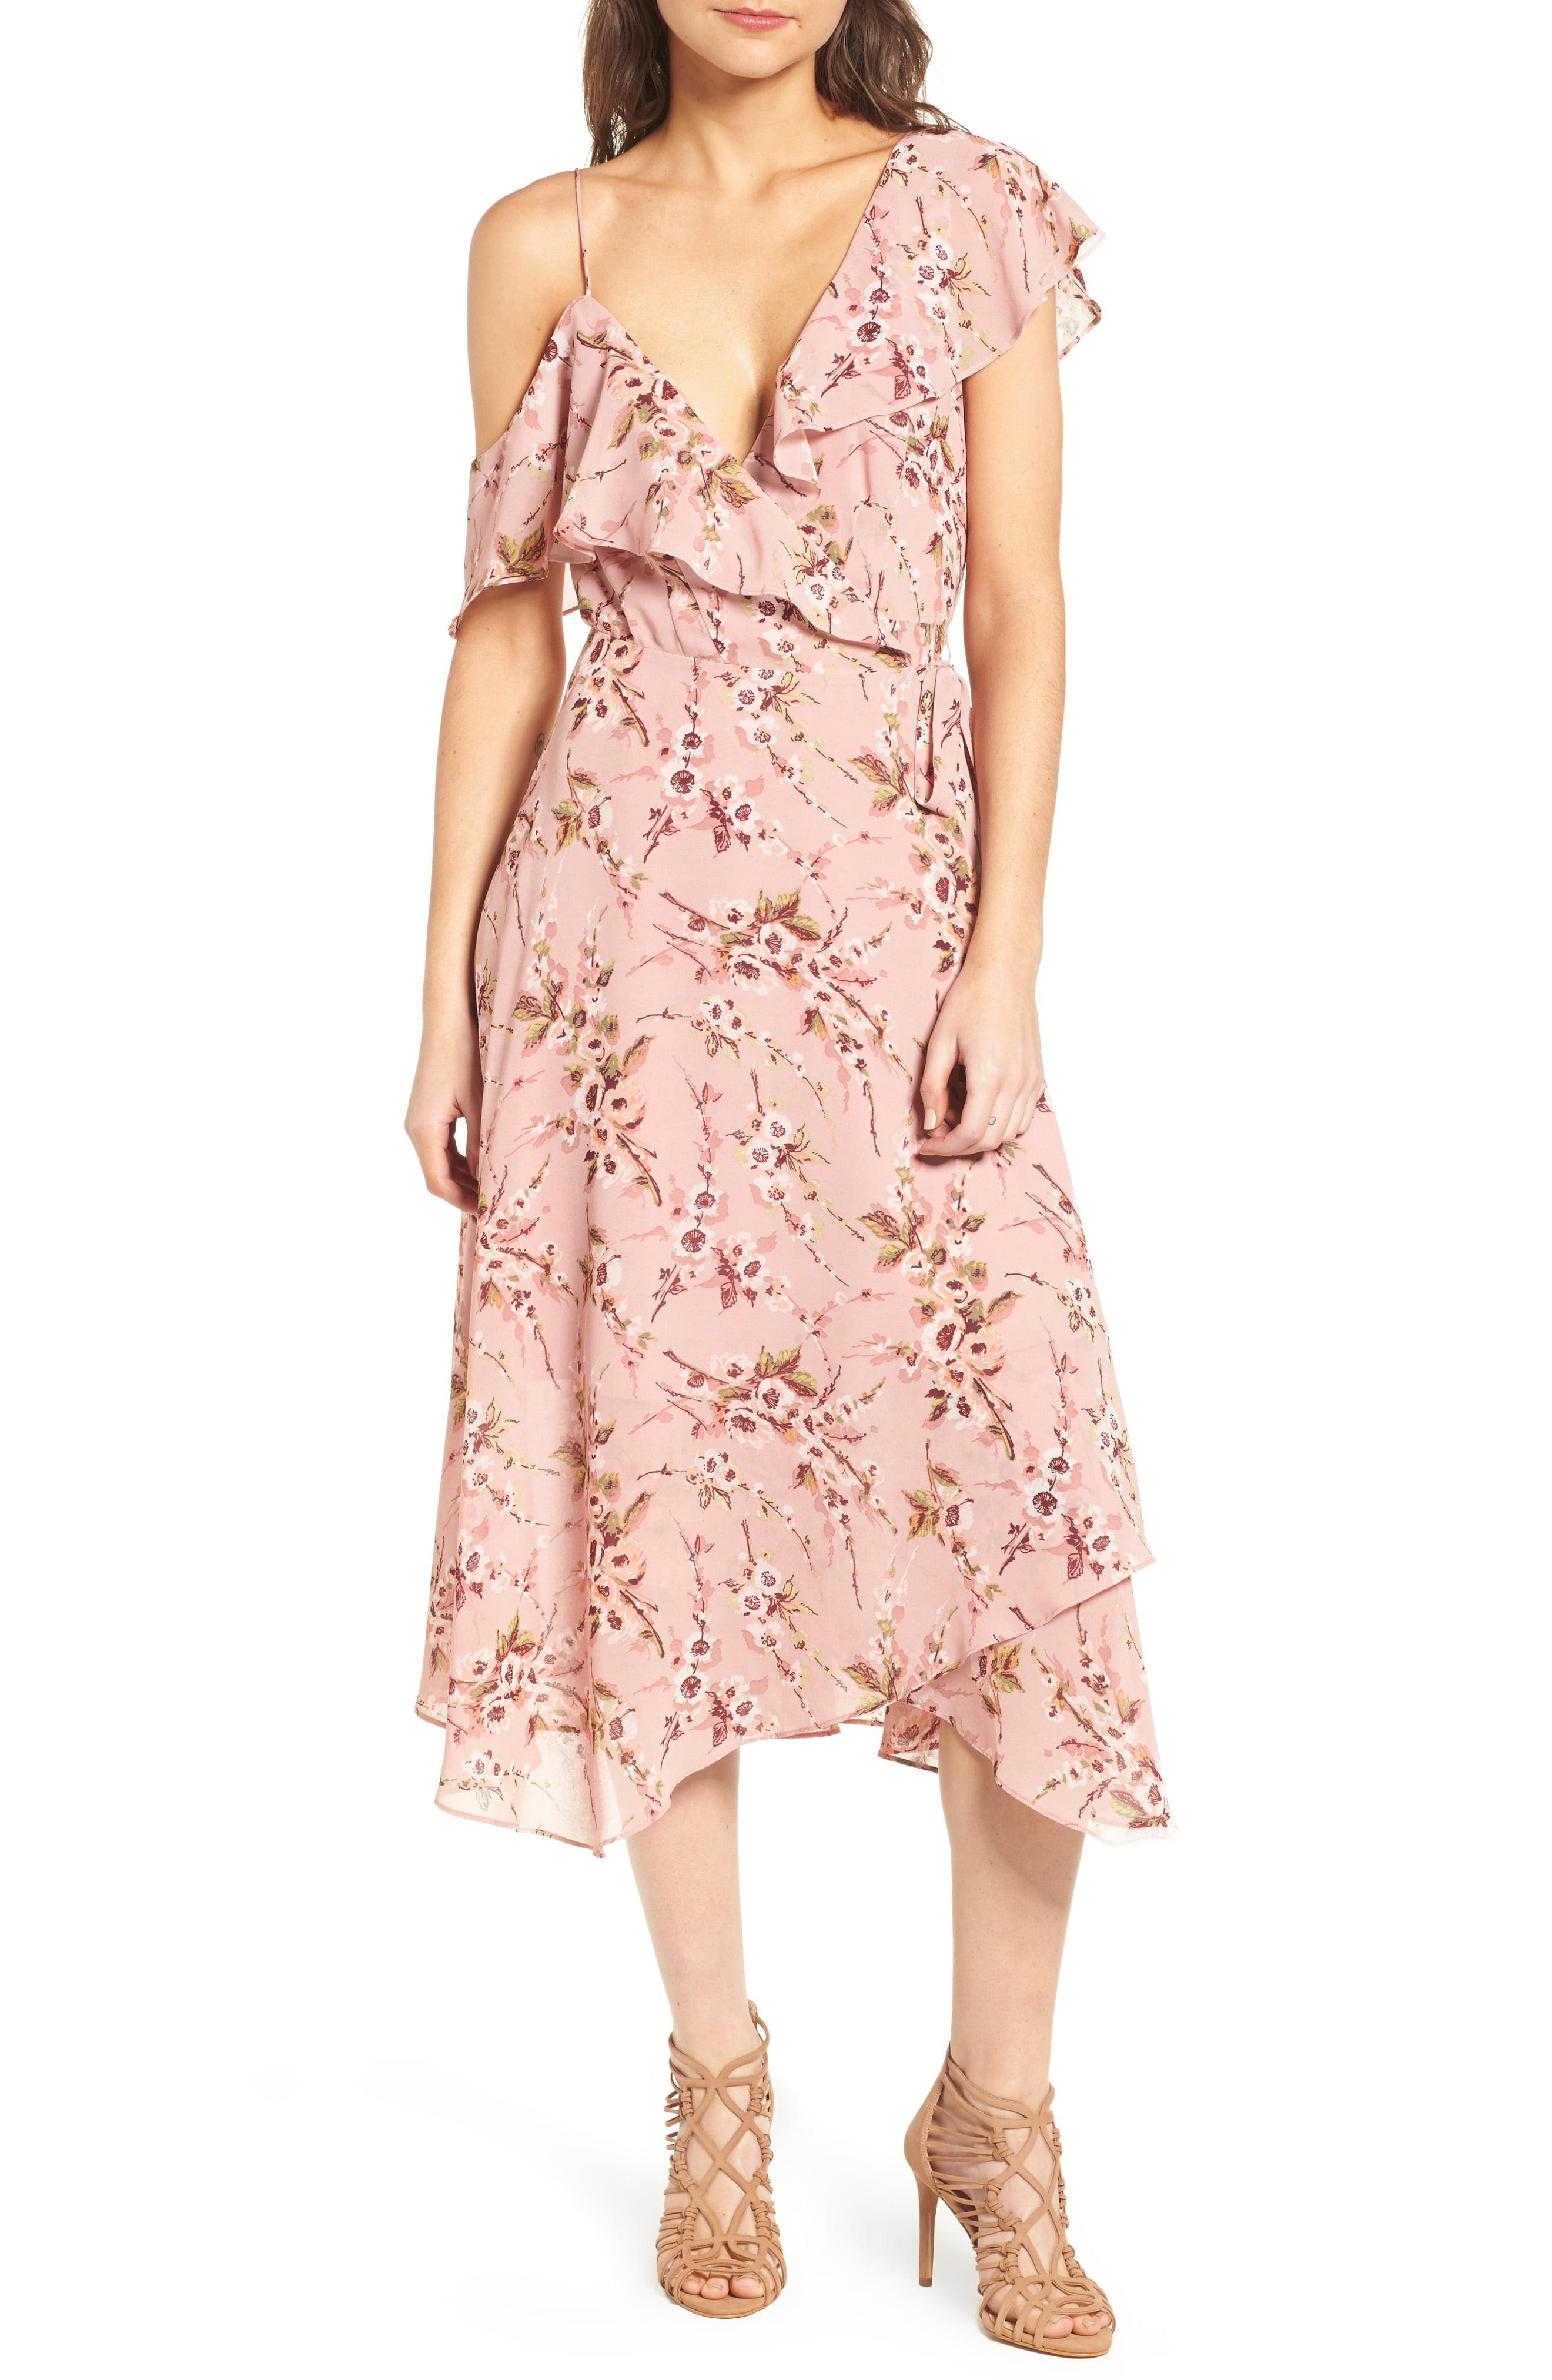 Vistoso Best Wedding Dress For Your Body Type Ideas Ornamento ...